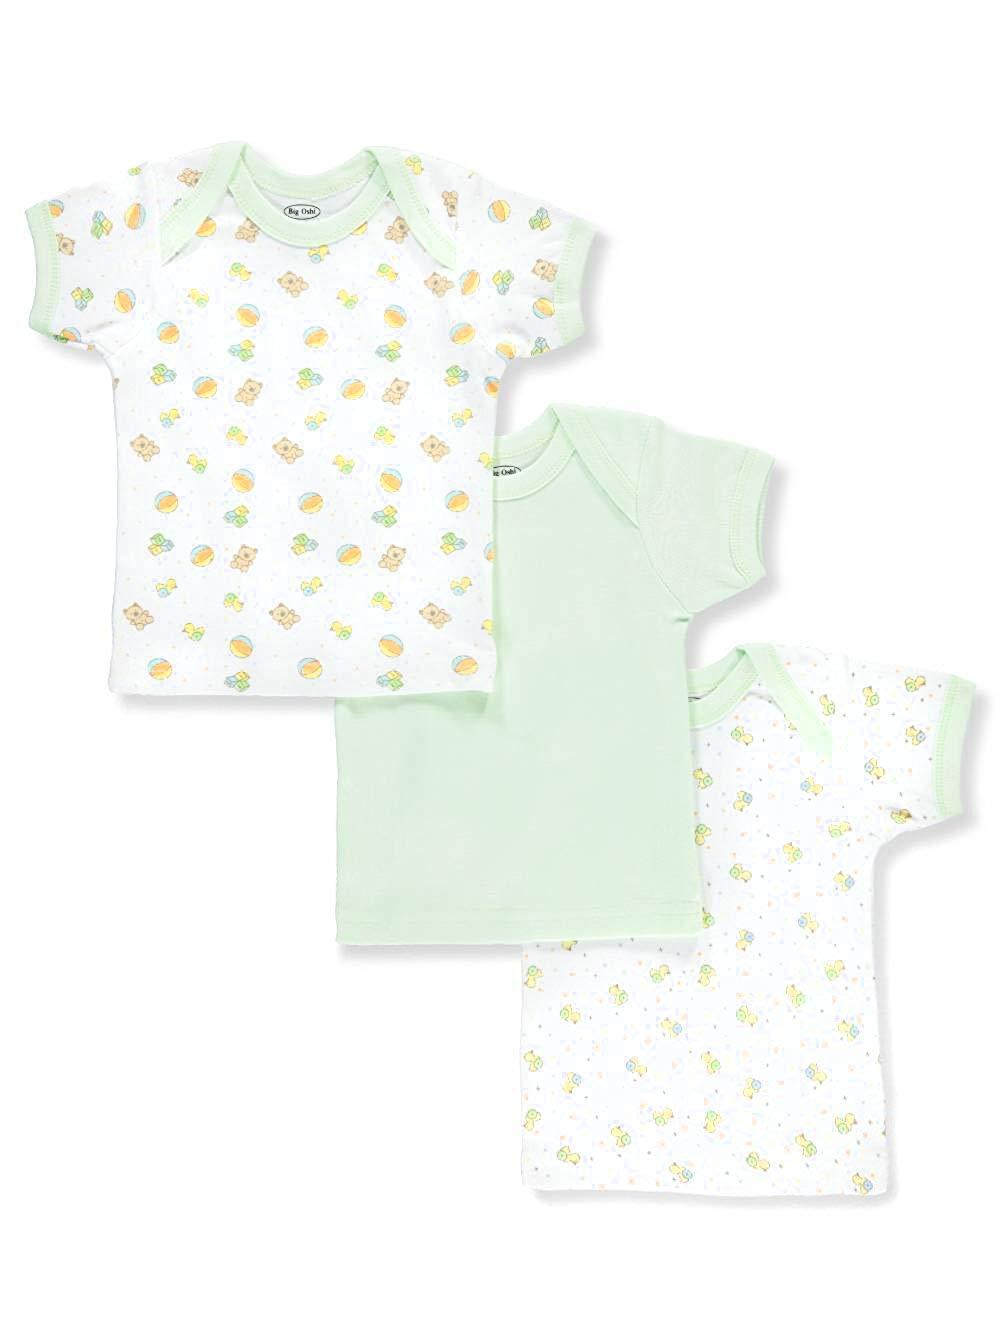 ef5bab2742f9 Cheap Soft Cotton Shirts Men, find Soft Cotton Shirts Men deals on ...